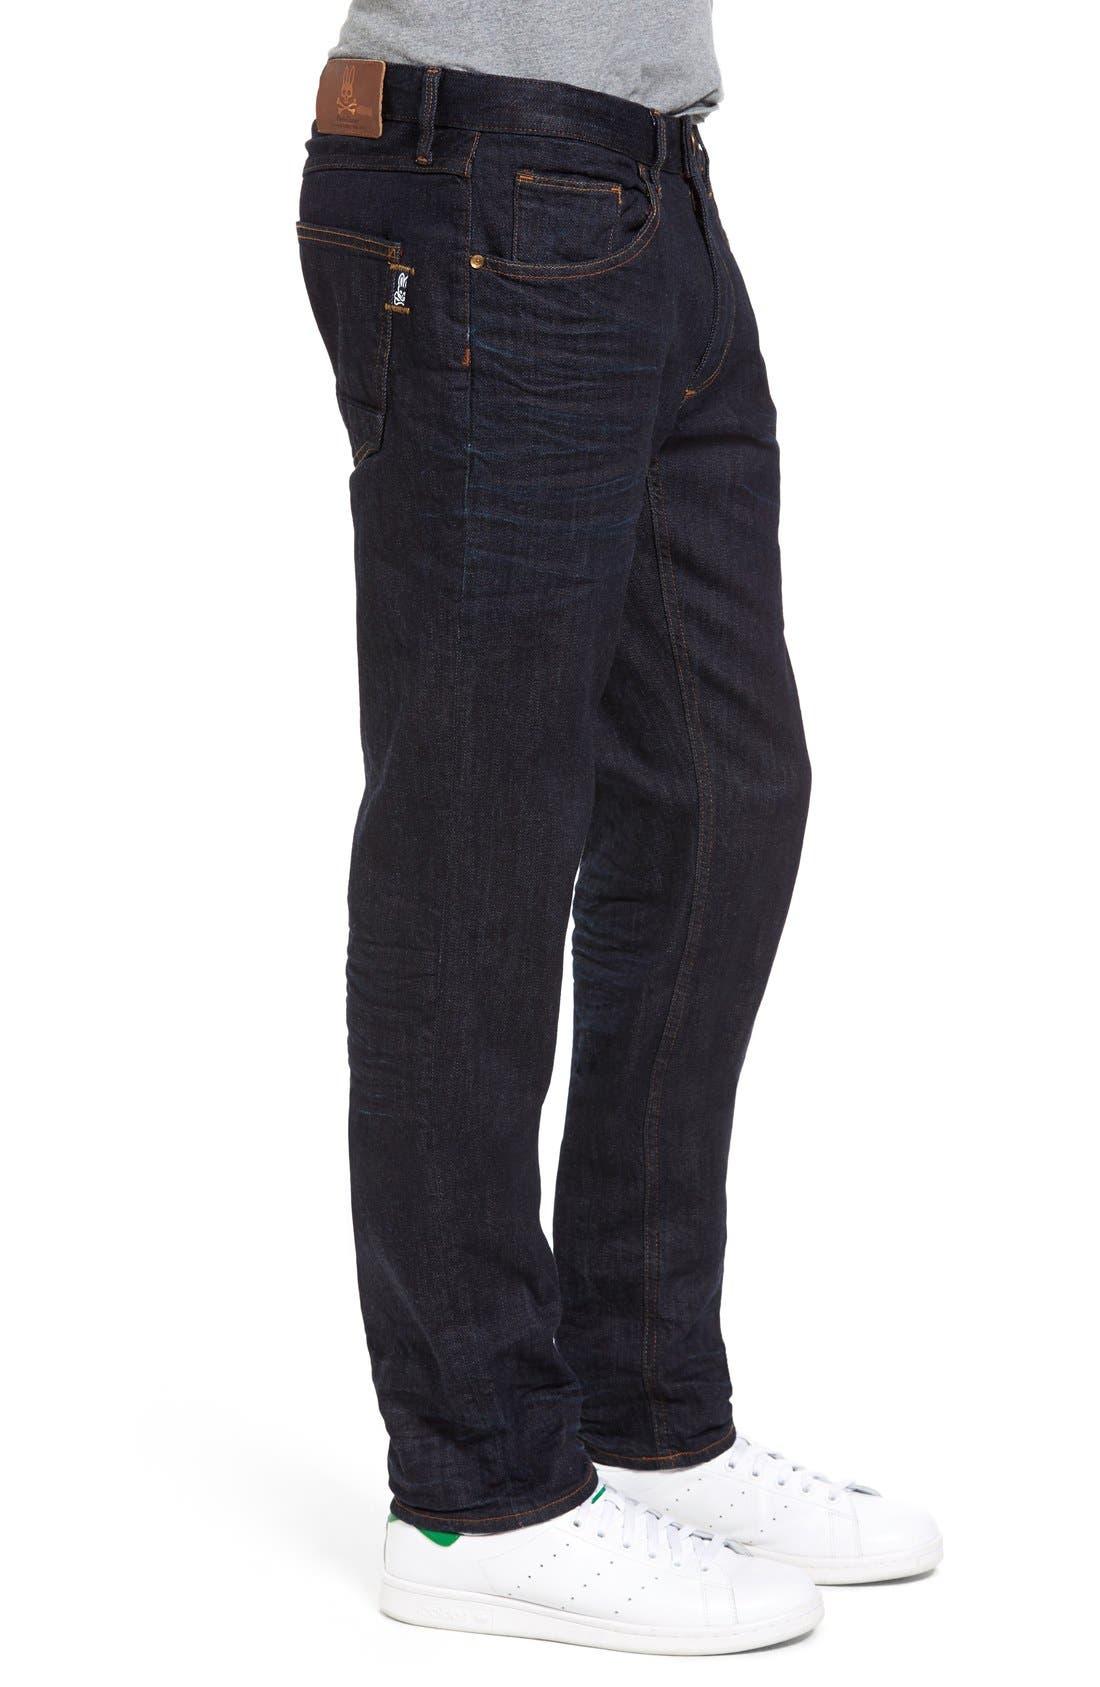 Canal Slim Fit Jeans,                             Alternate thumbnail 11, color,                             460